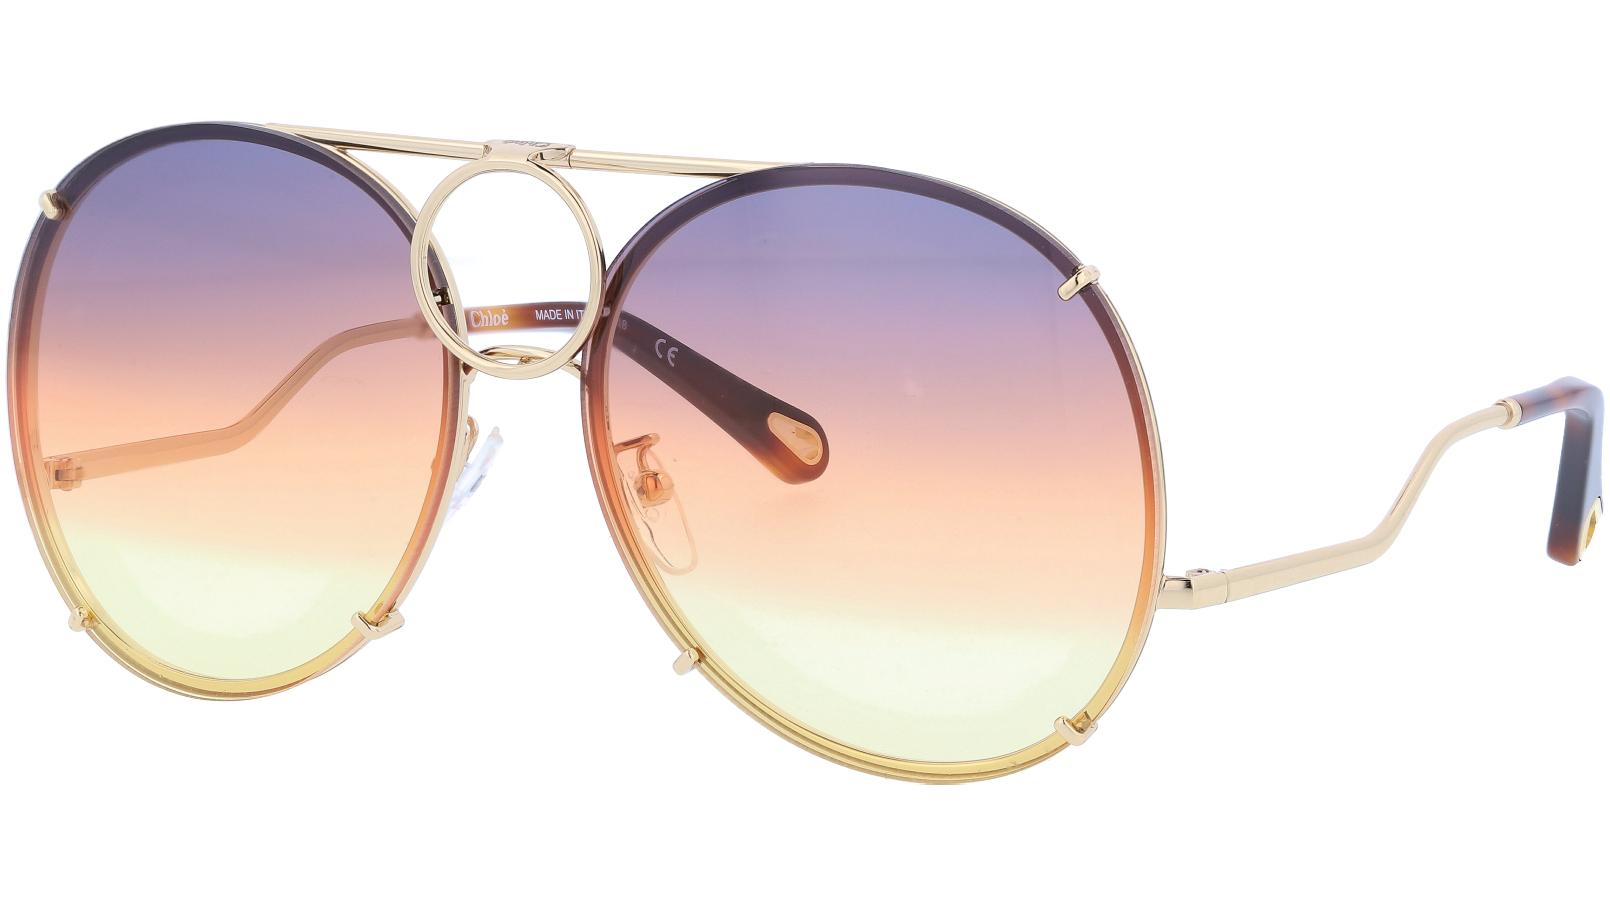 CHLOE CE145S 812 61 Gold Vicky Aviator Sunglasses